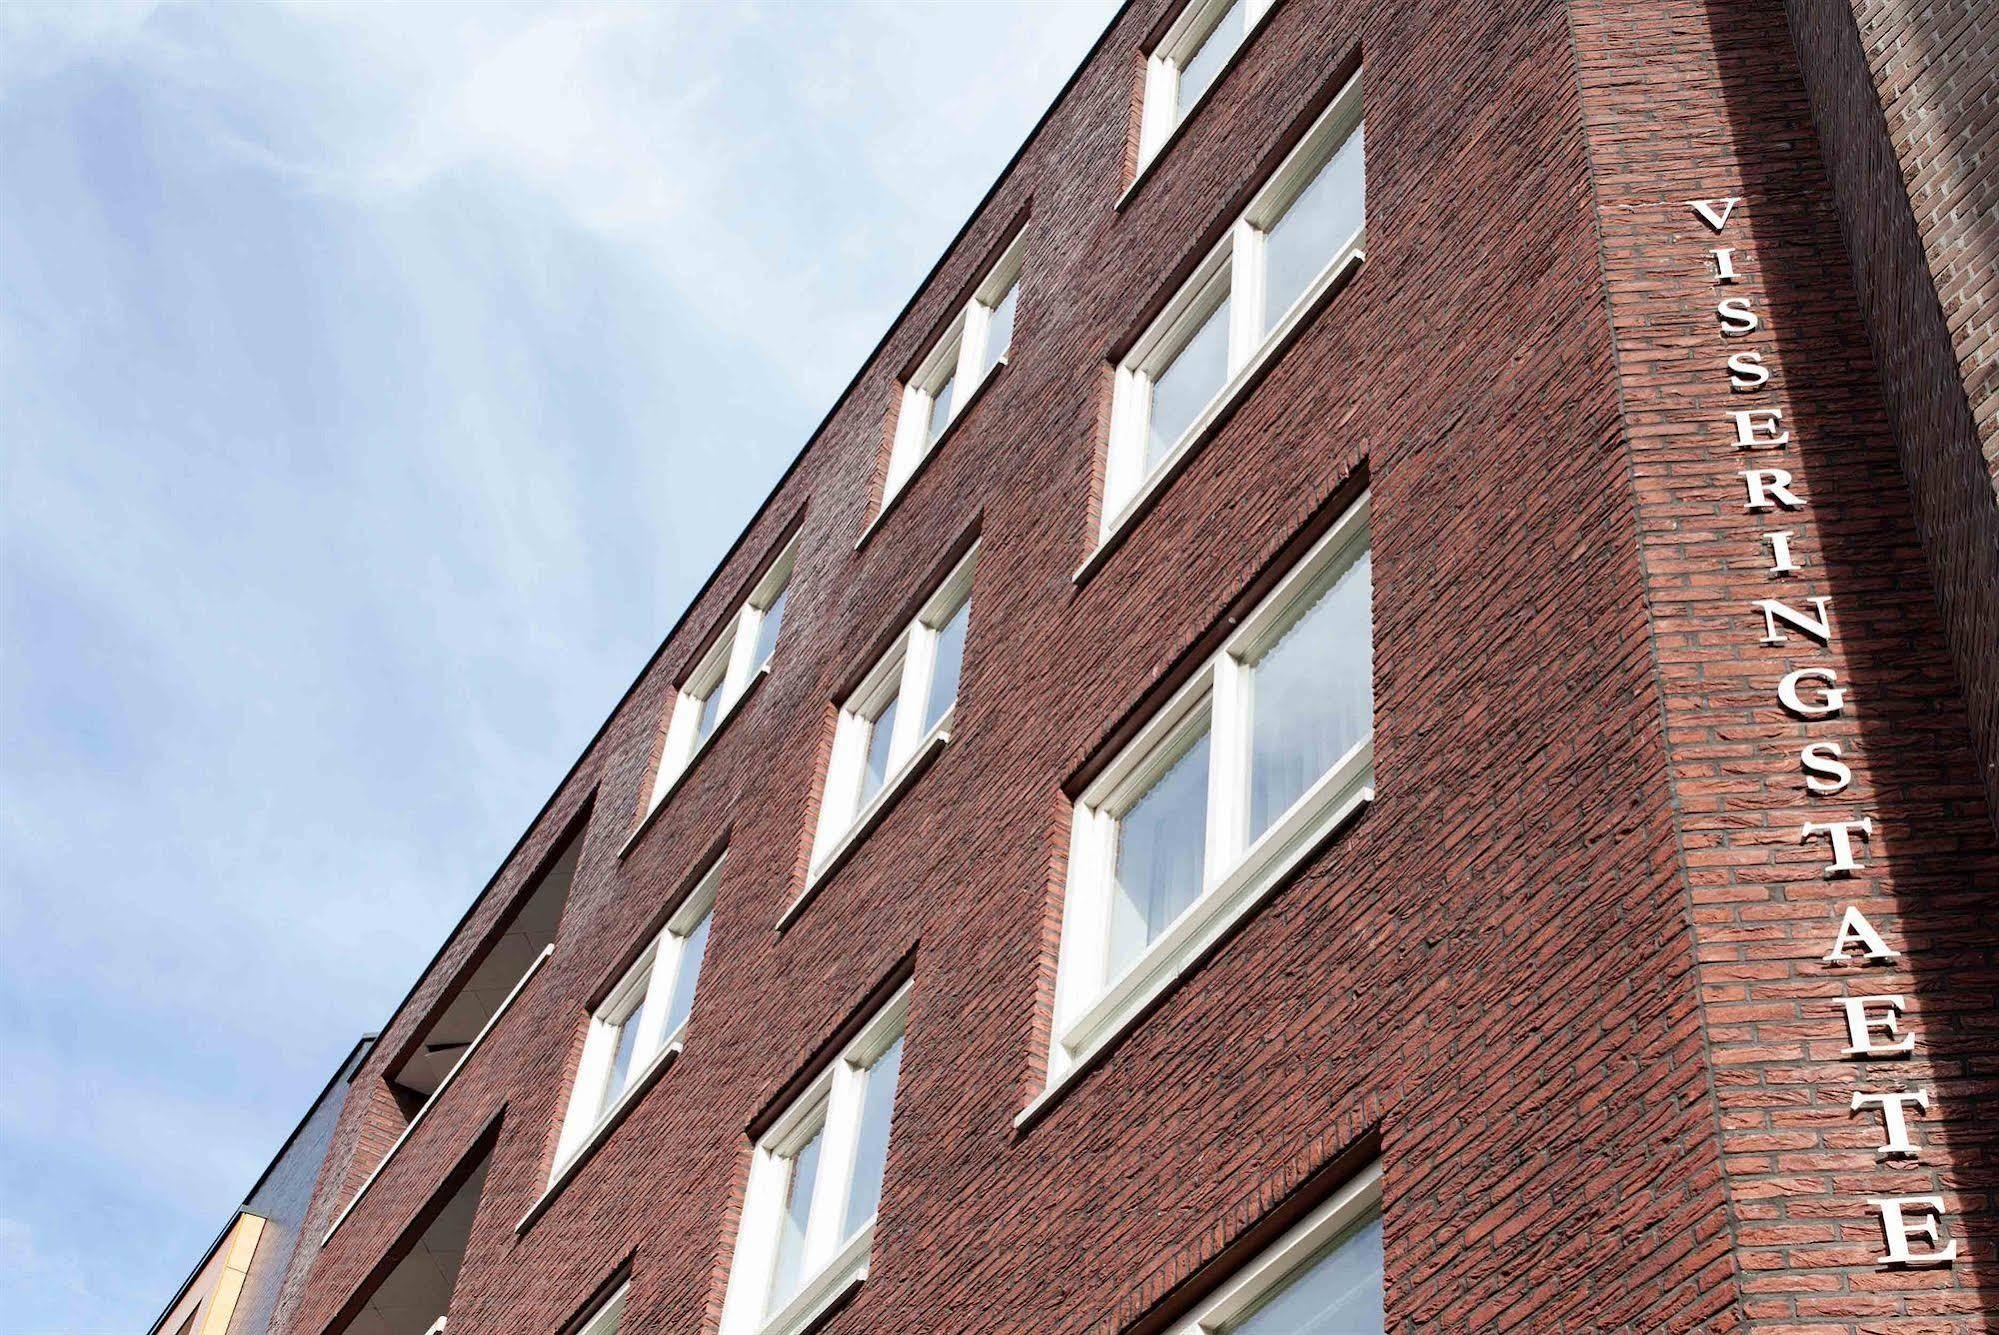 Visseringstaete Apartments